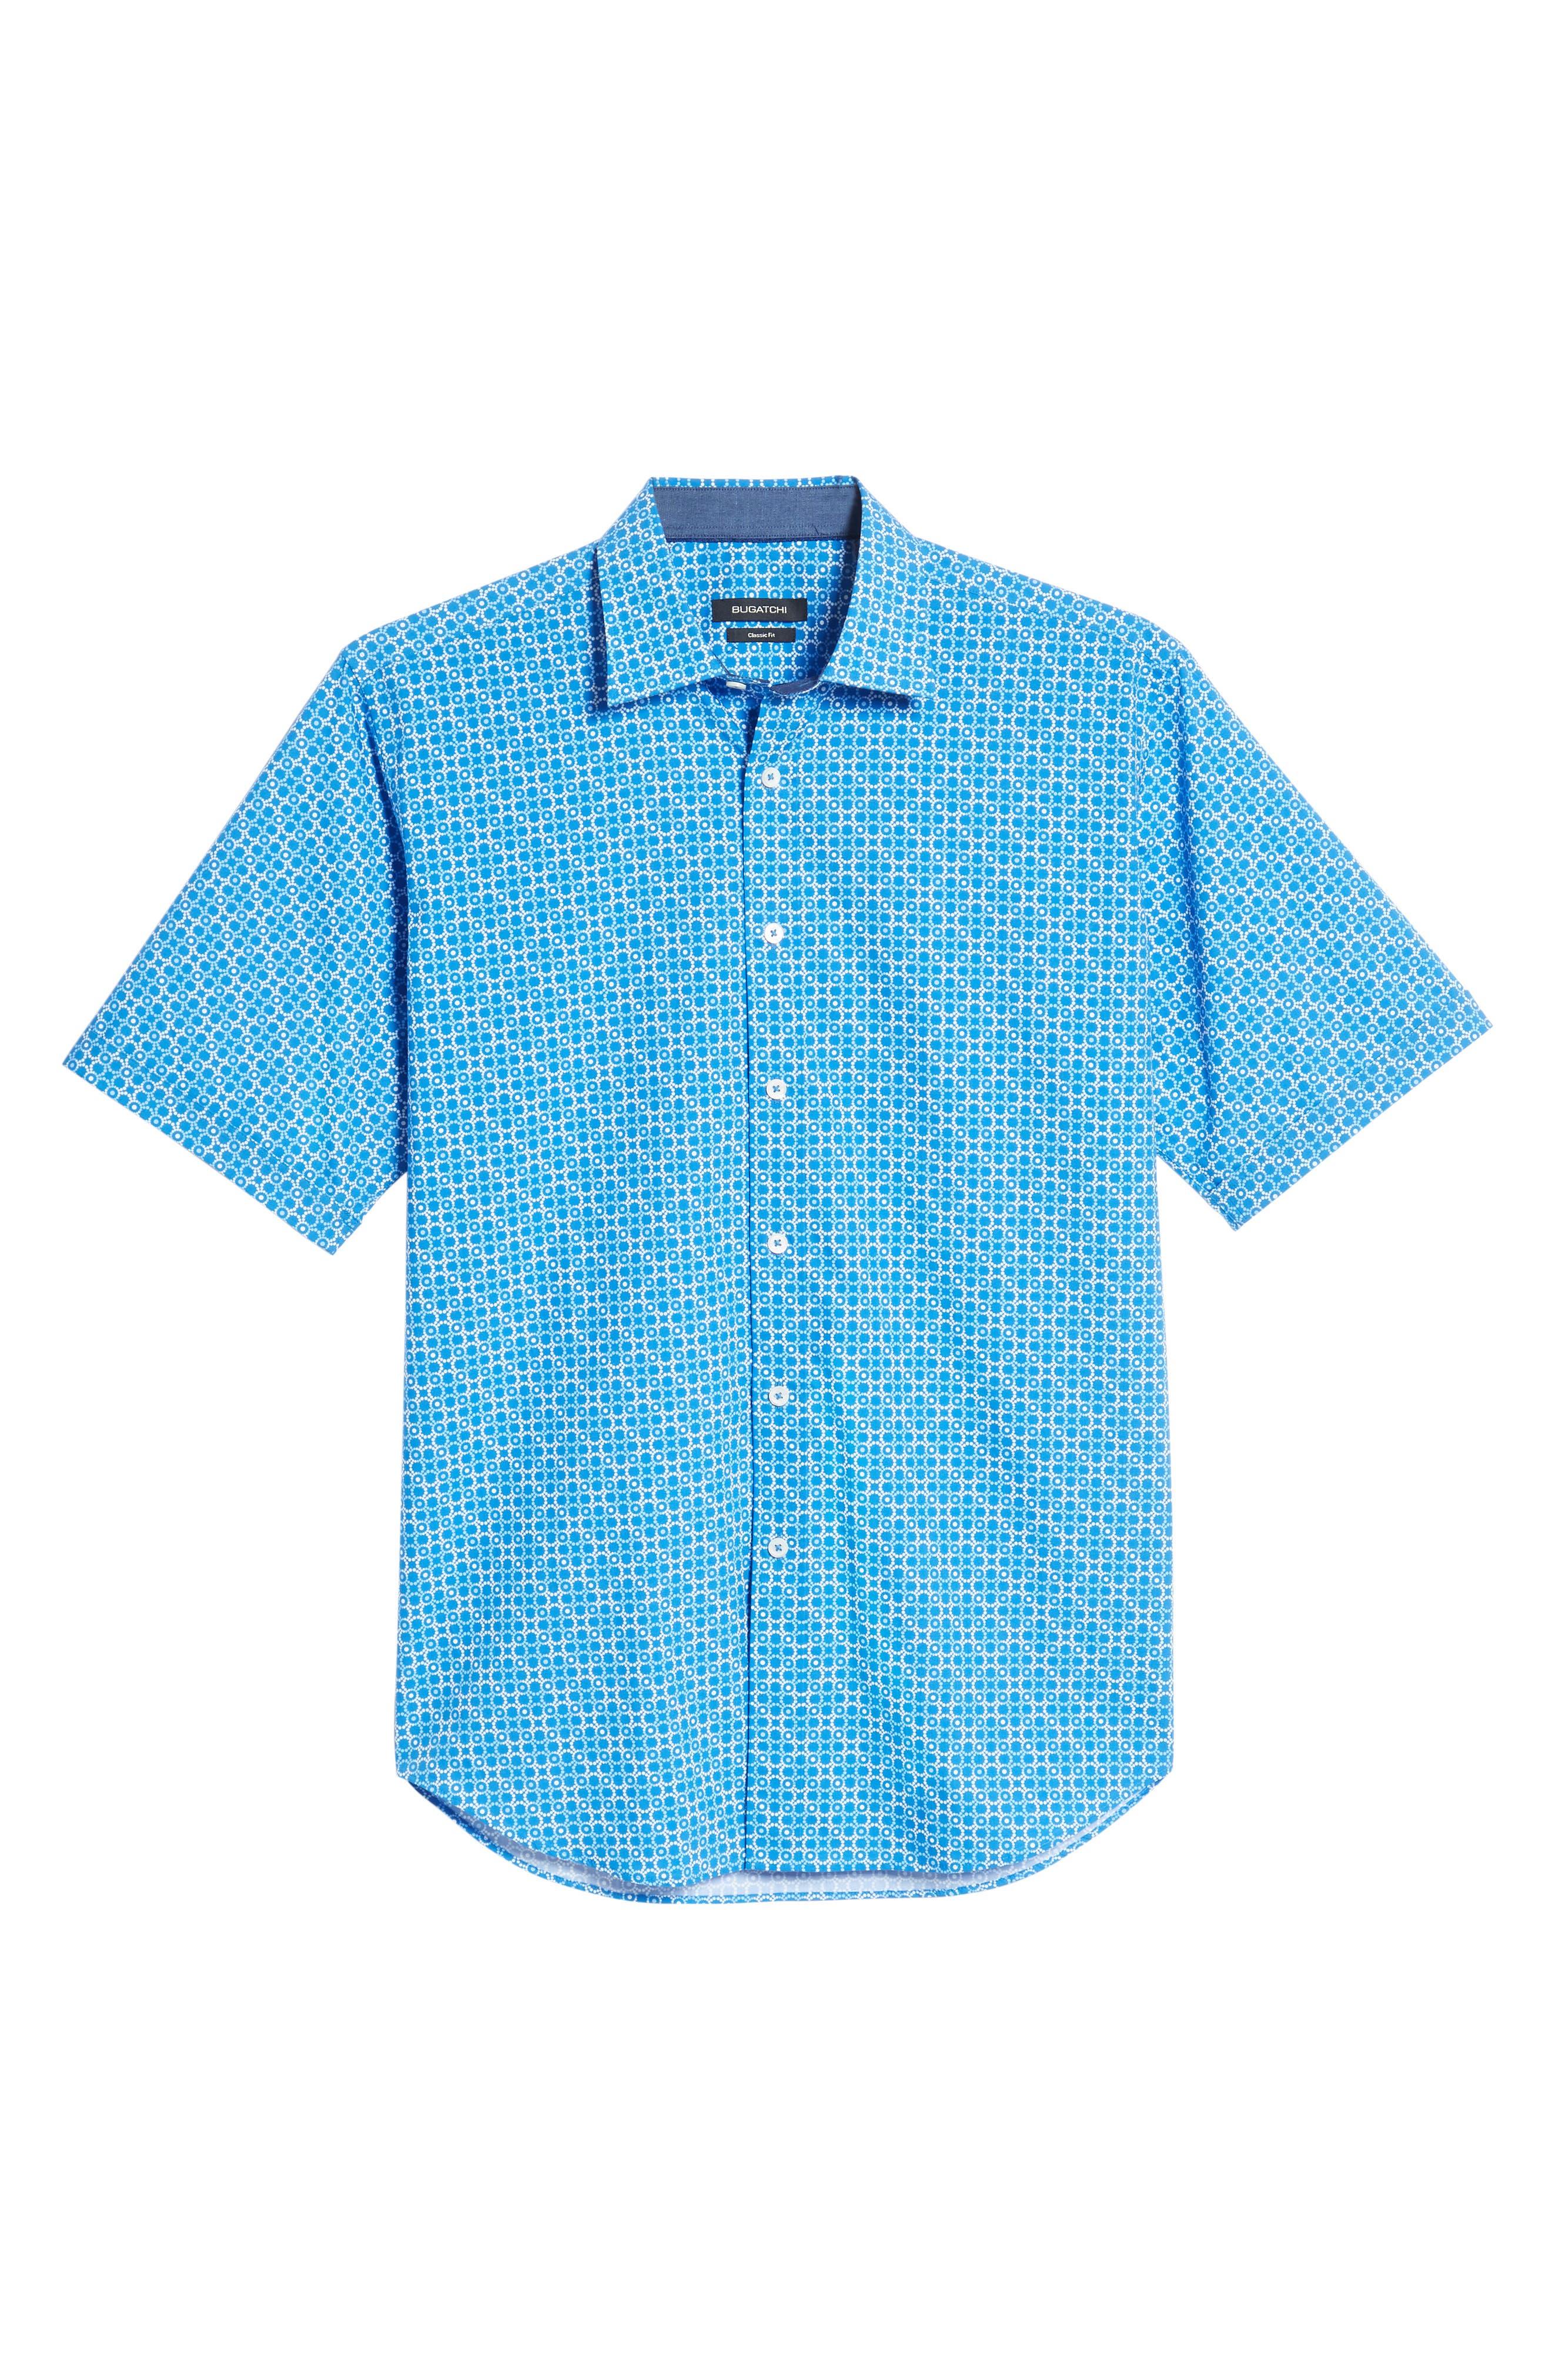 Classic Fit Circle Grid Sport Shirt,                             Alternate thumbnail 6, color,                             422